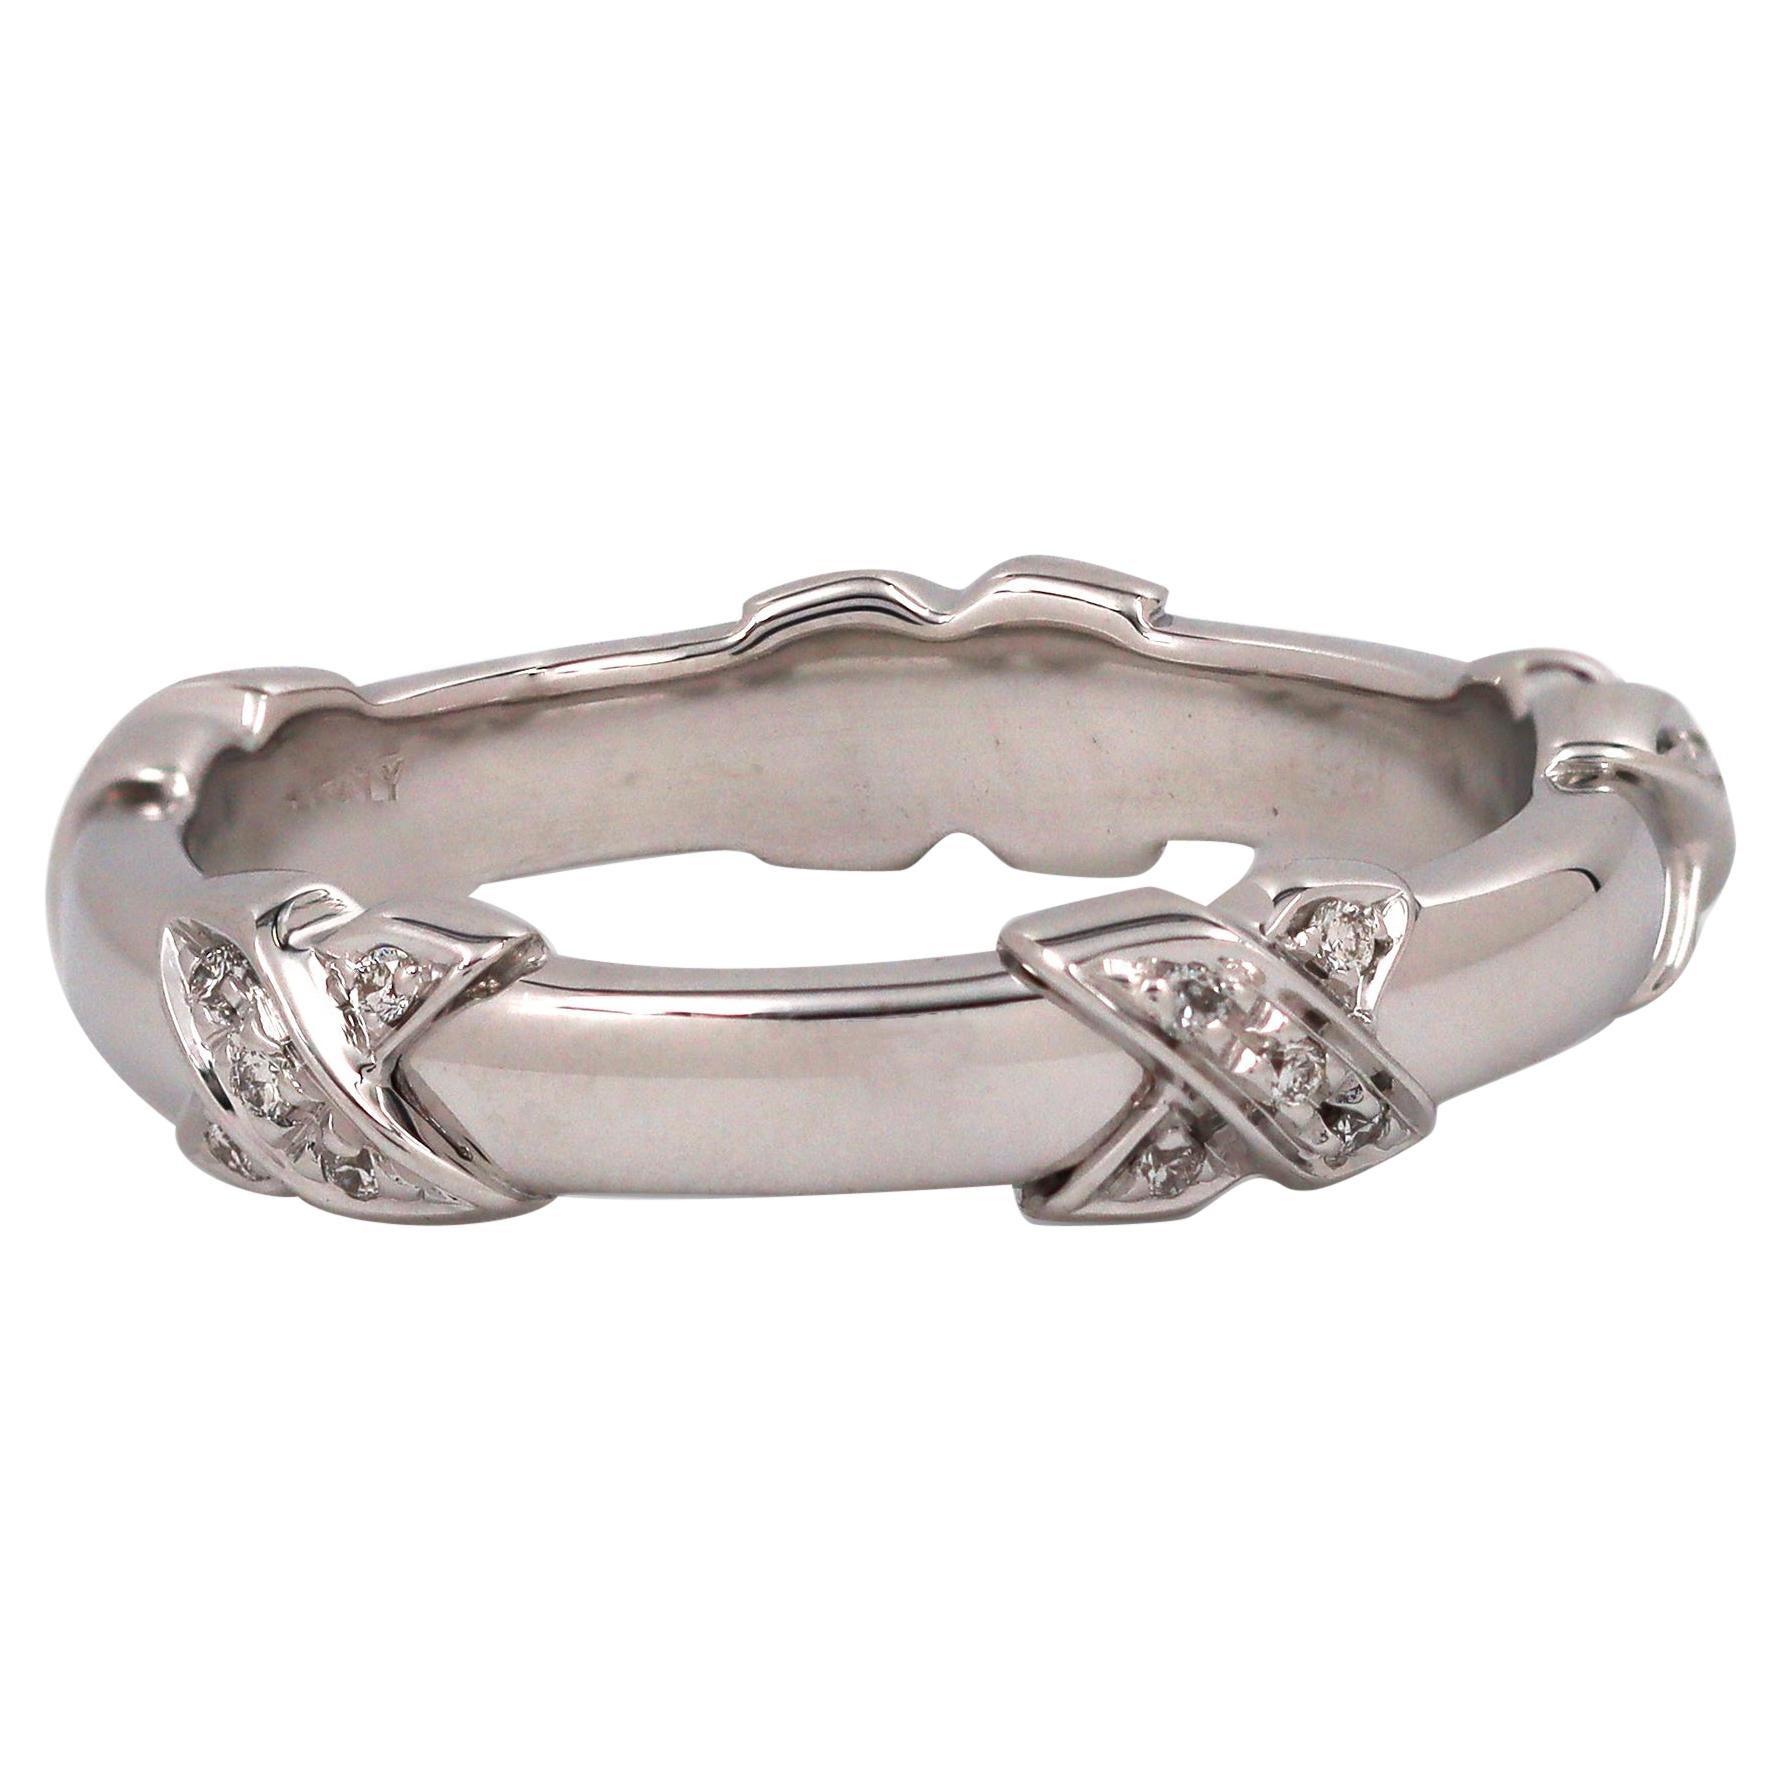 Tiffany & Co. Signature X White Gold Diamond Ring